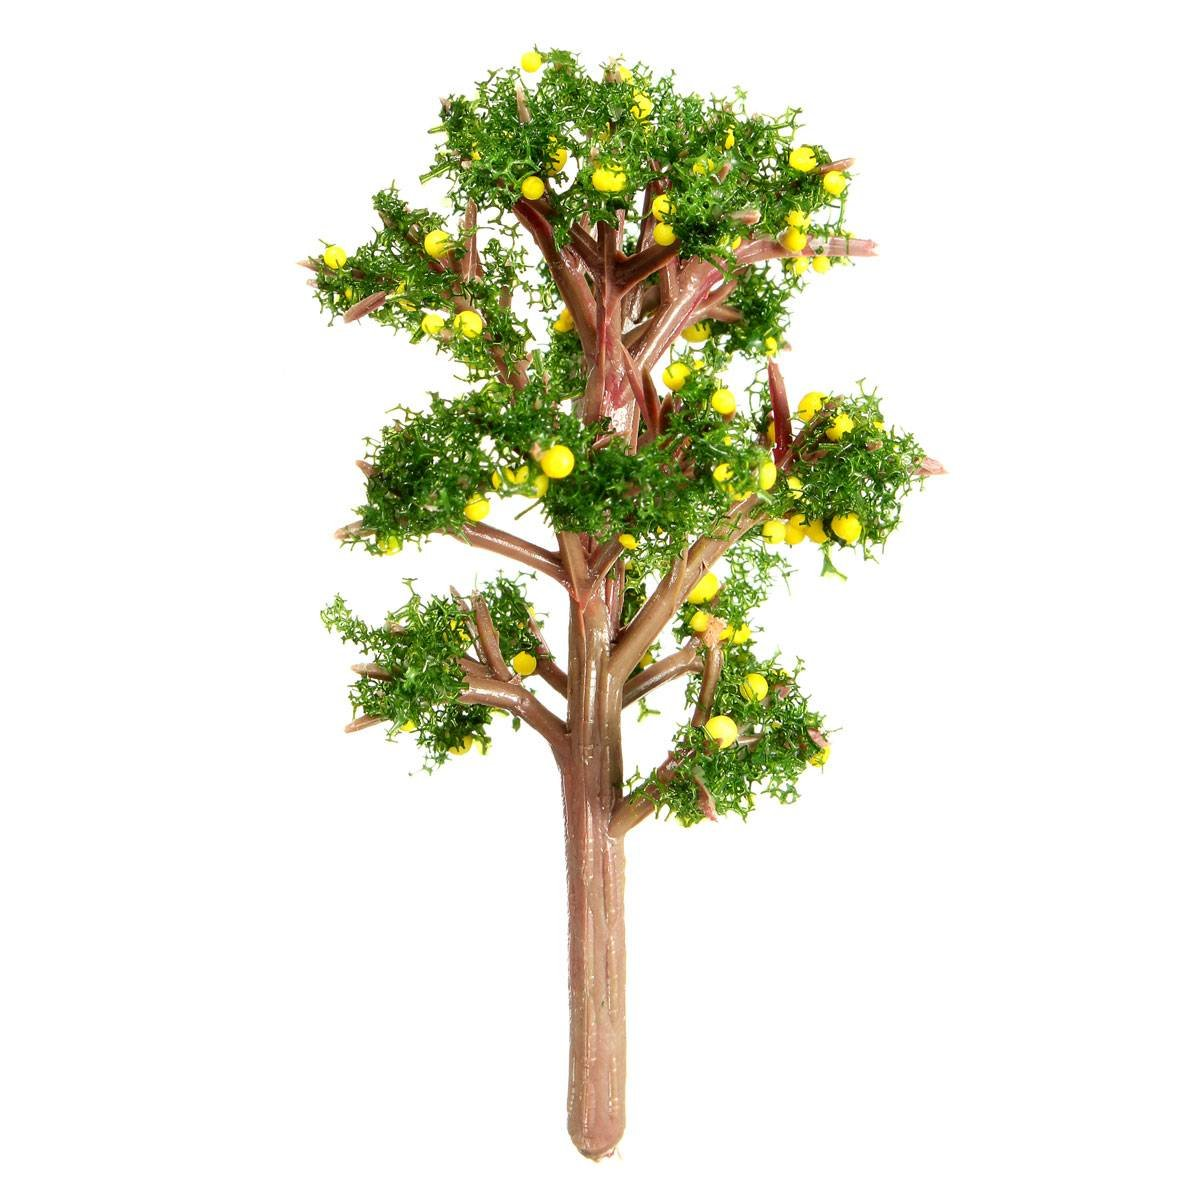 HOT-Miniature Emulation Orange Tree Moss Bonsai Micro Landscape DIY Craft Garden Ornament